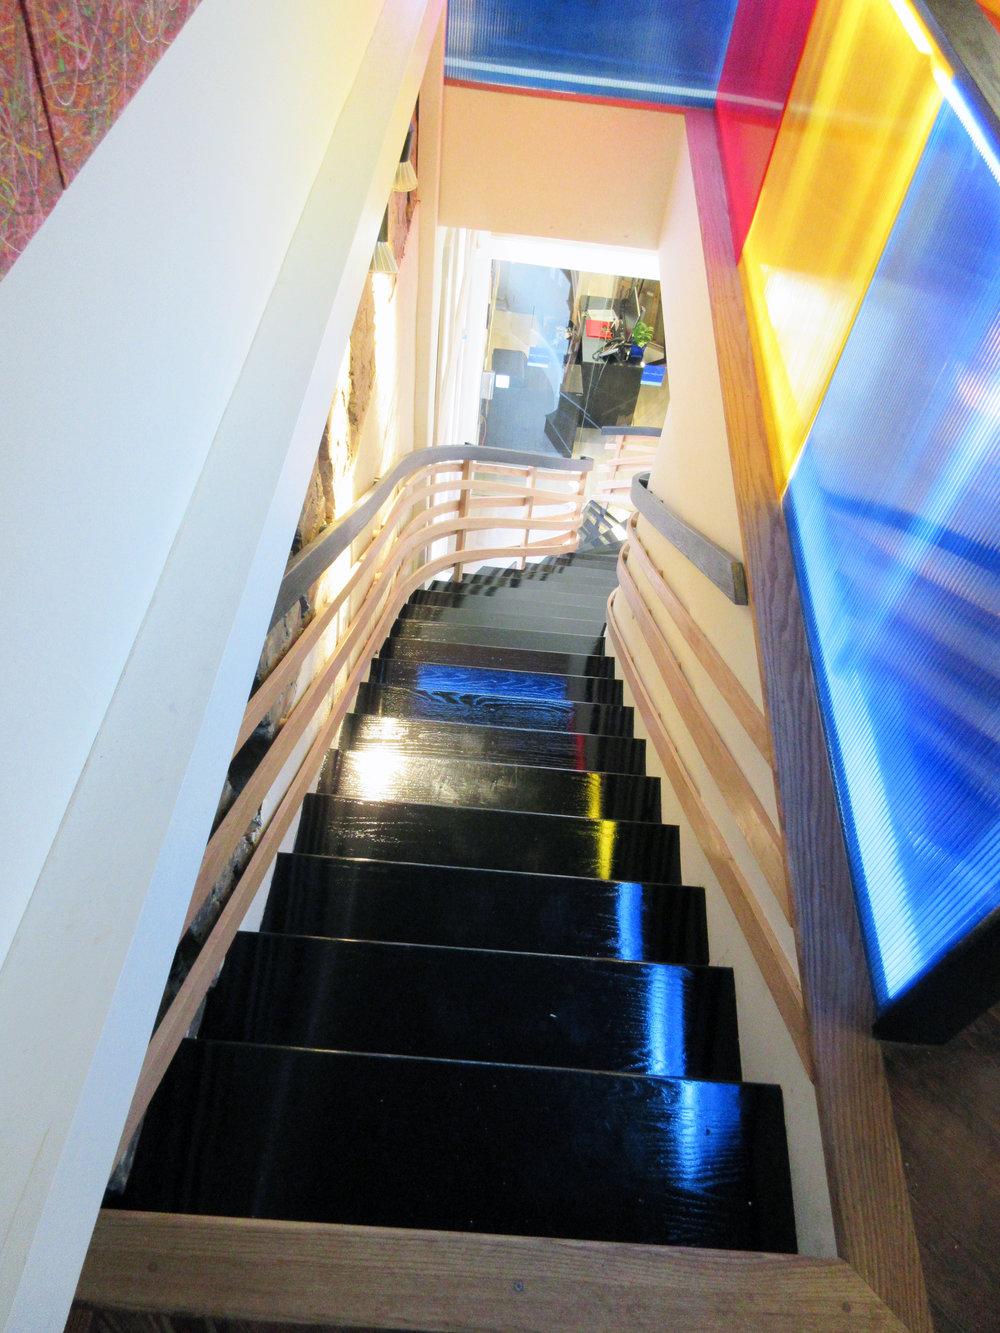 Gallery Photo Stairs.jpg